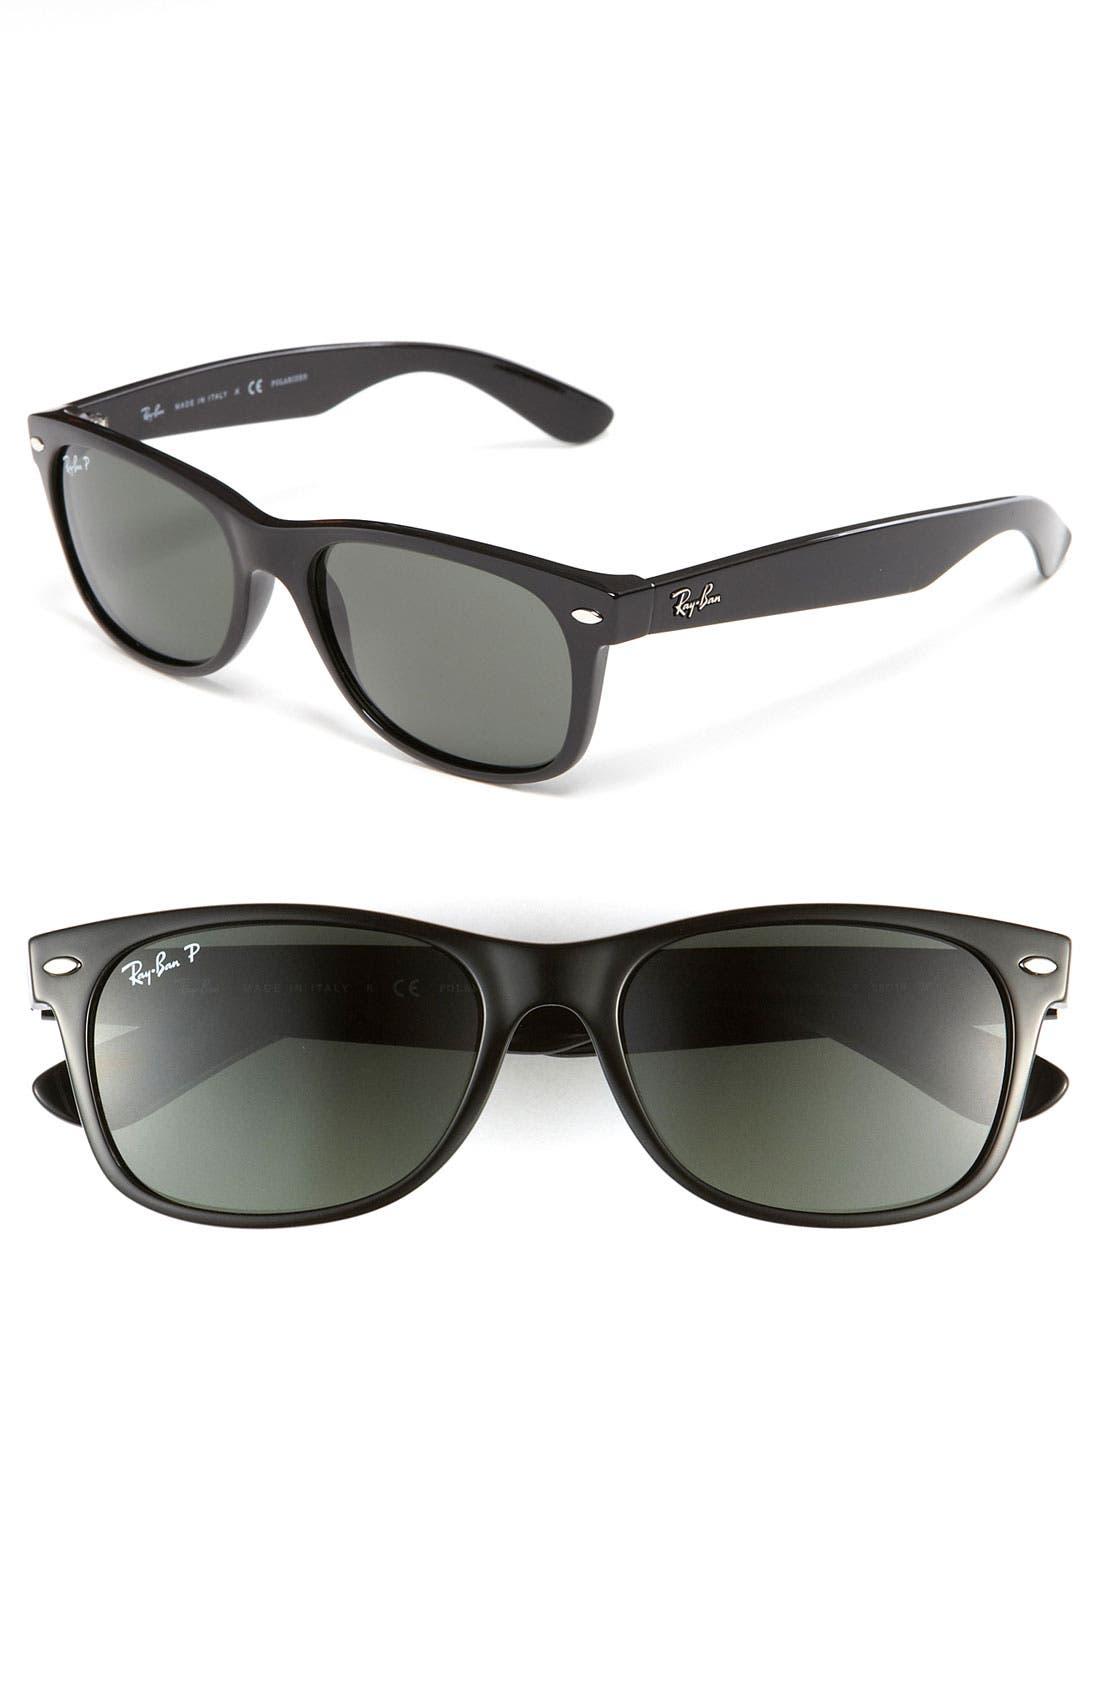 Ray-Ban Standard New Wayfarer 55Mm Polarized Sunglasses -